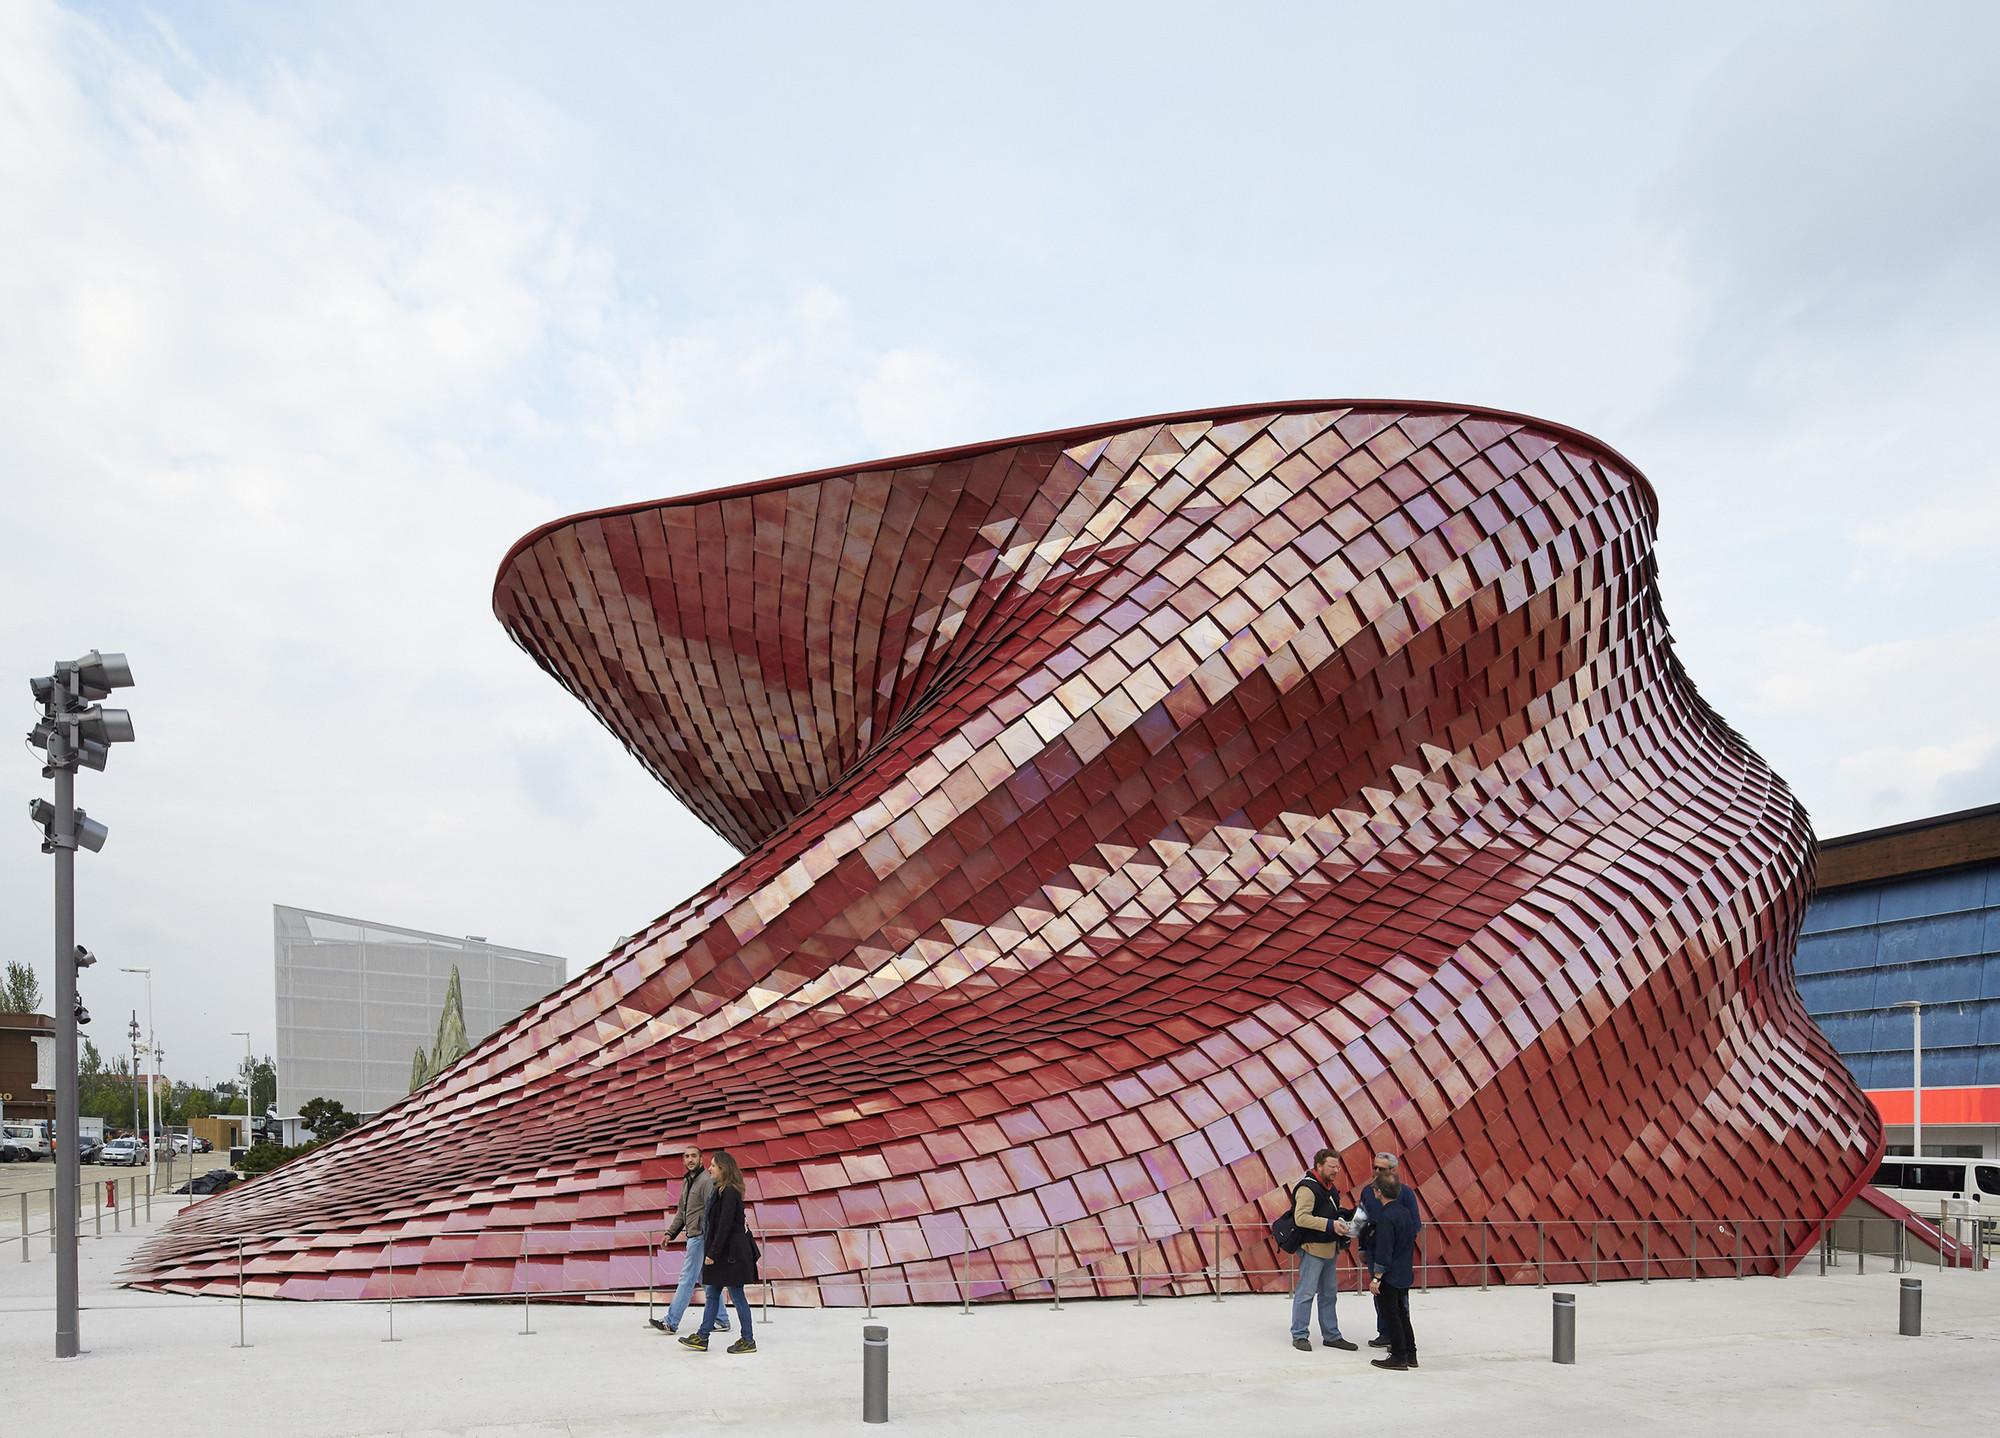 Expo Milão 2015: Pavilhão de Vanke / Daniel Libeskind, © Hufton+Crow